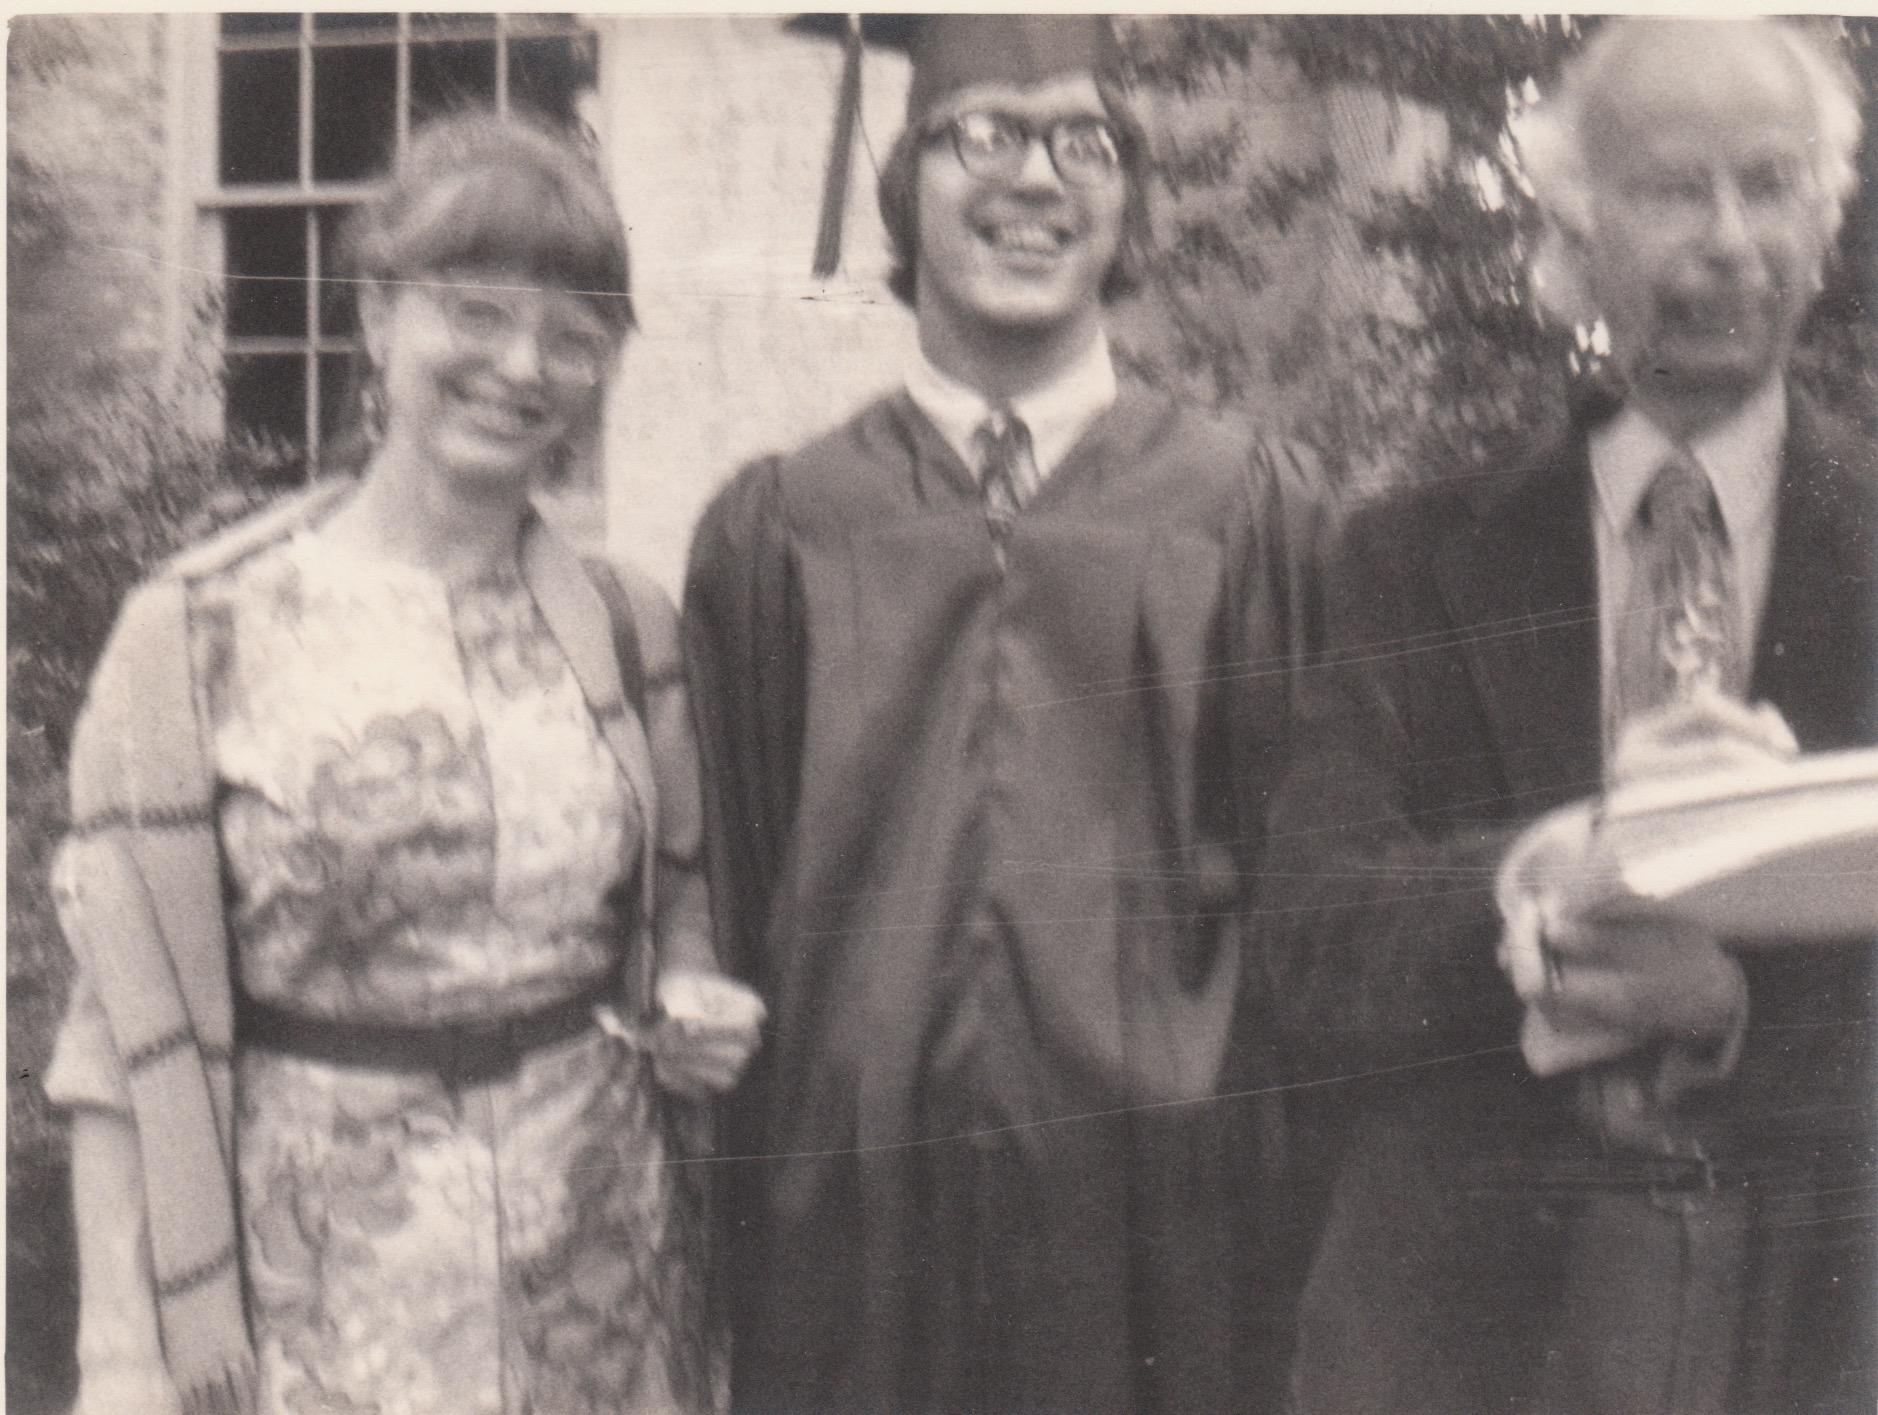 GA Photo Graduation Gene + Mom + Dad 1.jpeg